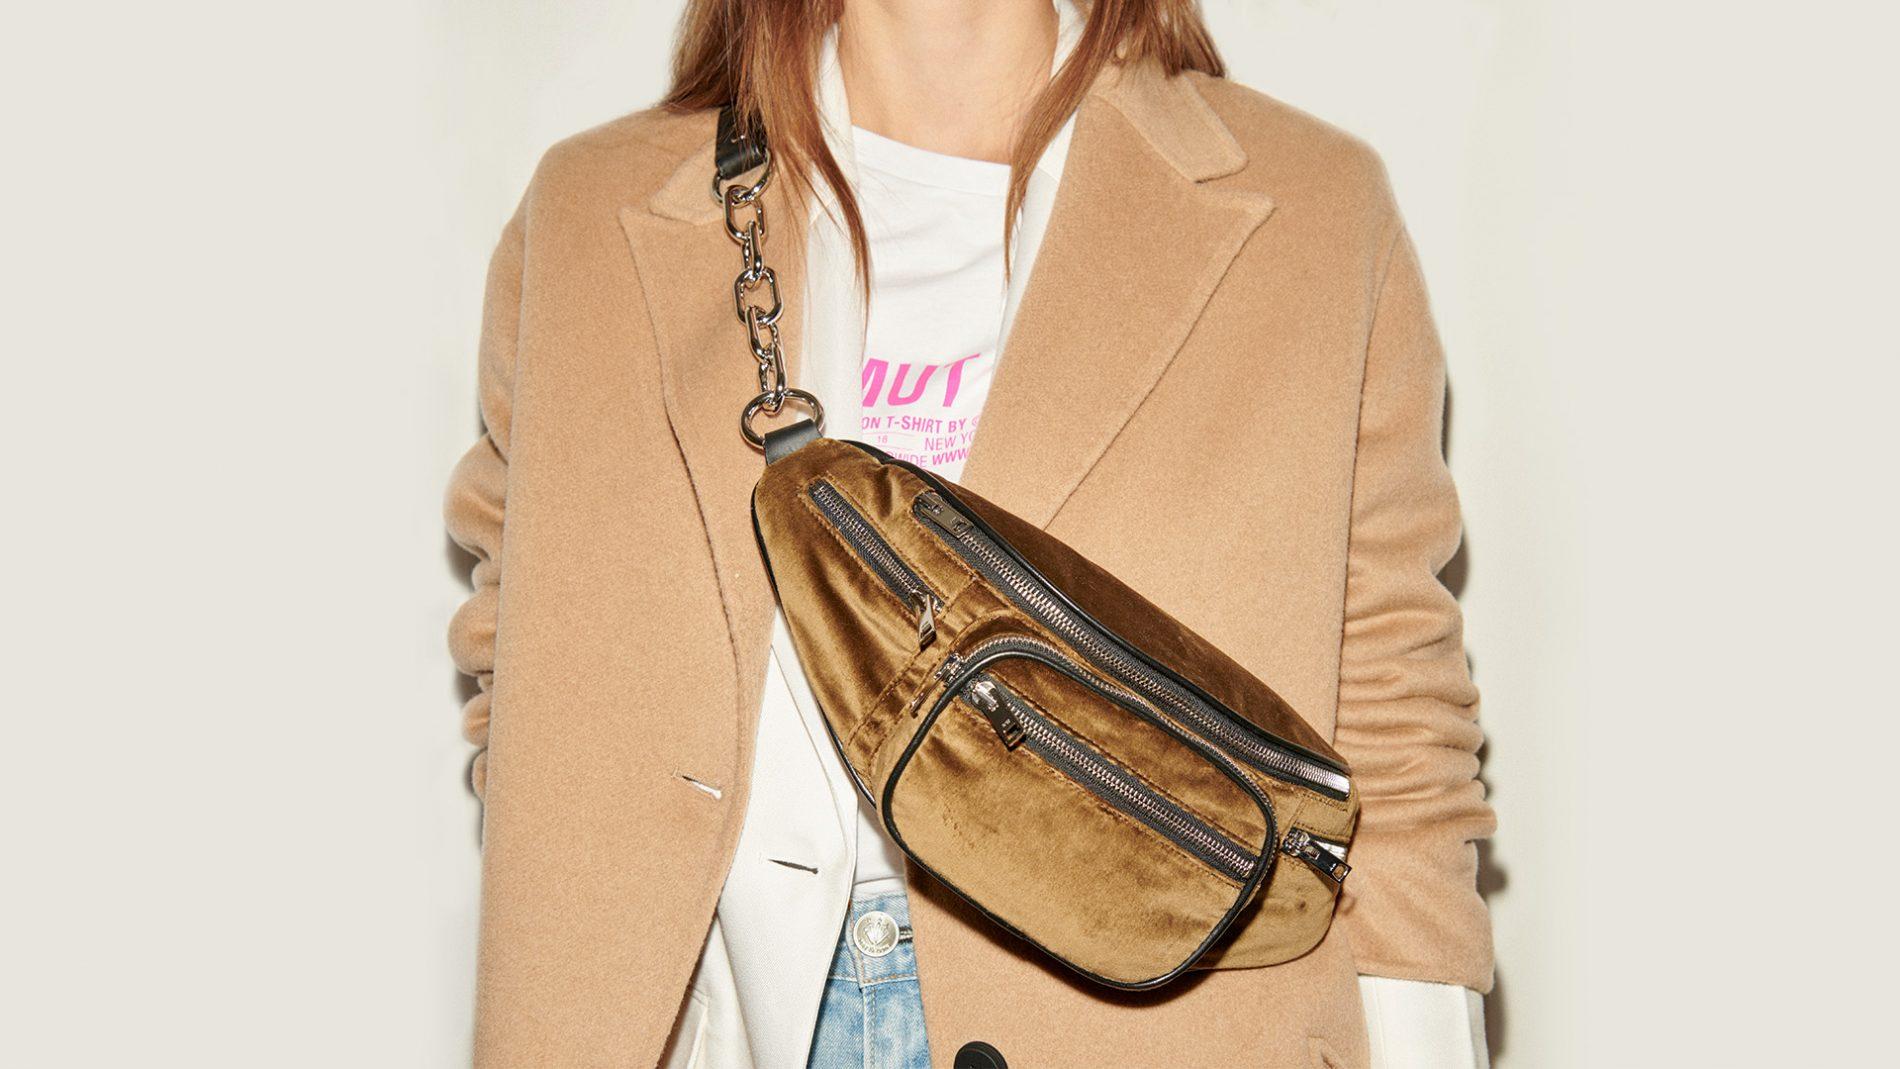 El Corte Inglés Designer Ready-To-Wear Handbags Alexander Wang Kenzo Helmut Lang Rag & Bone